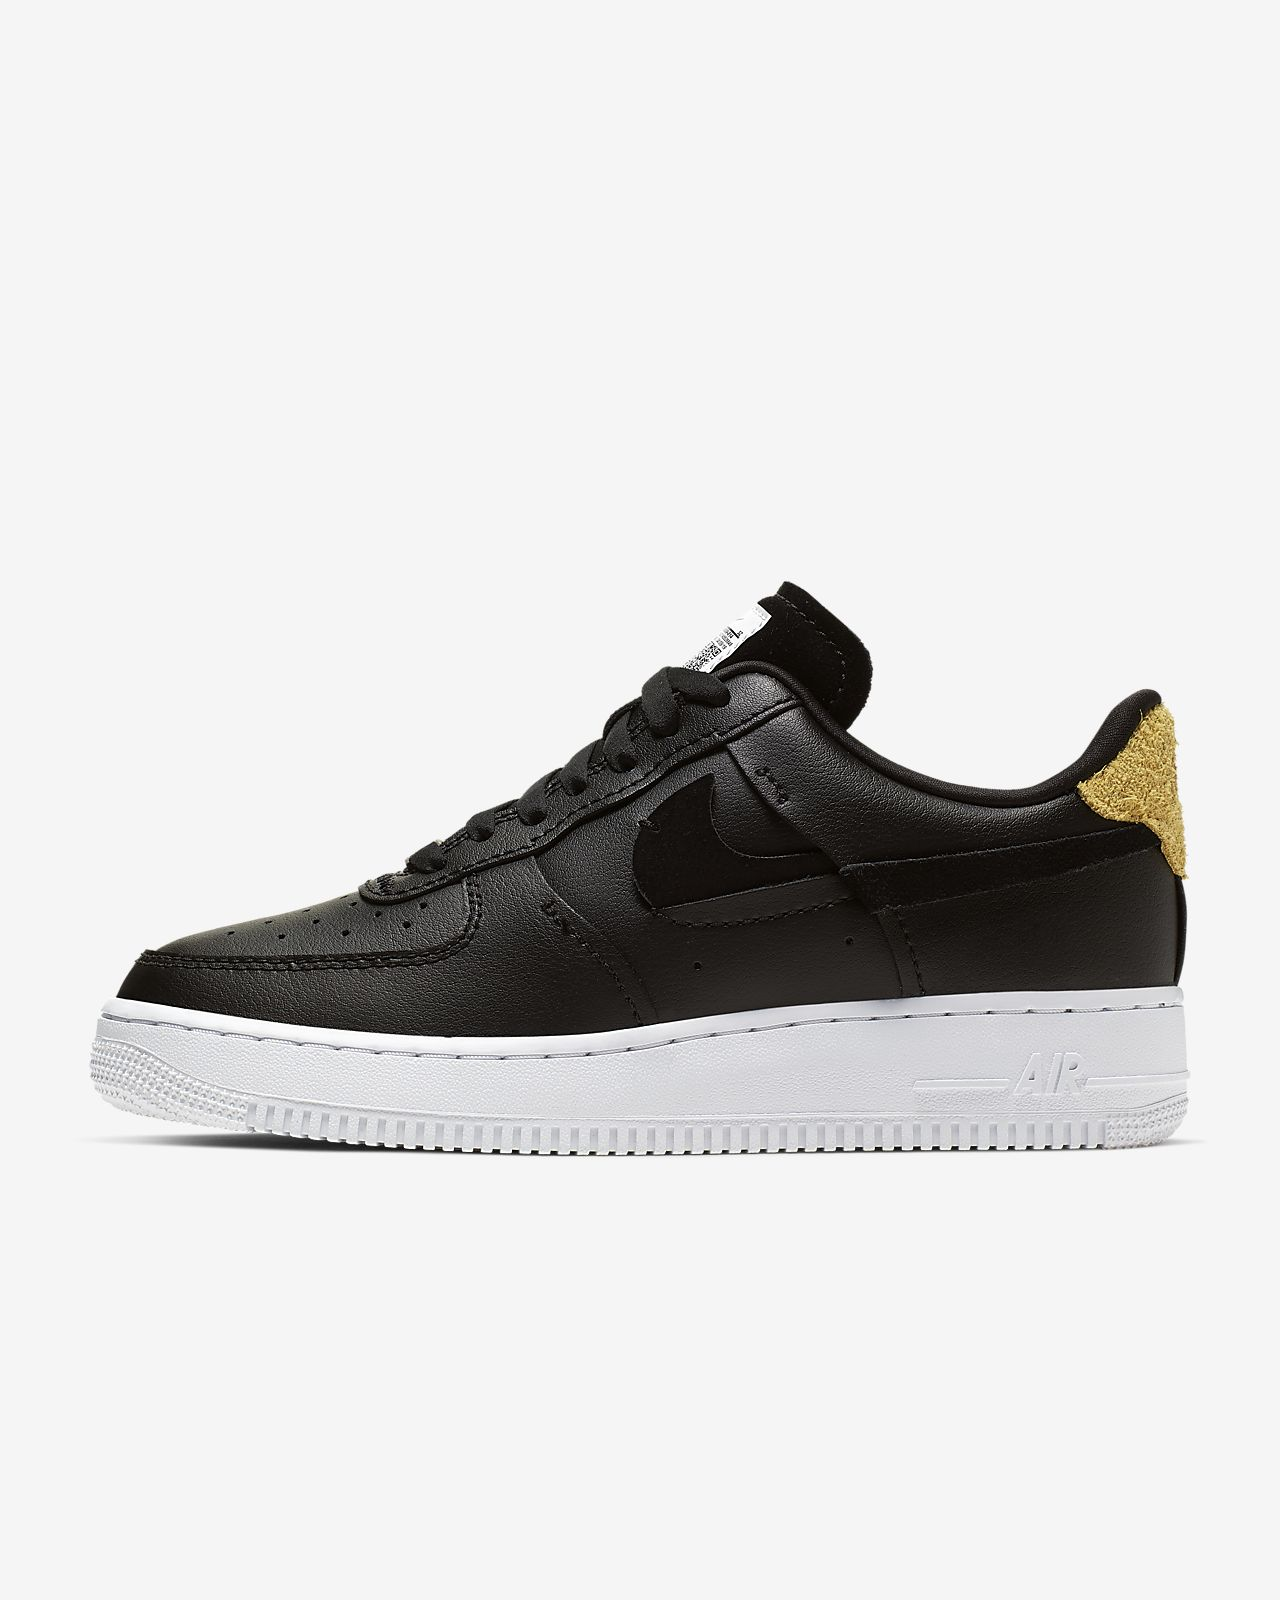 Nike Air Force 1 '07 Lux Damenschuh